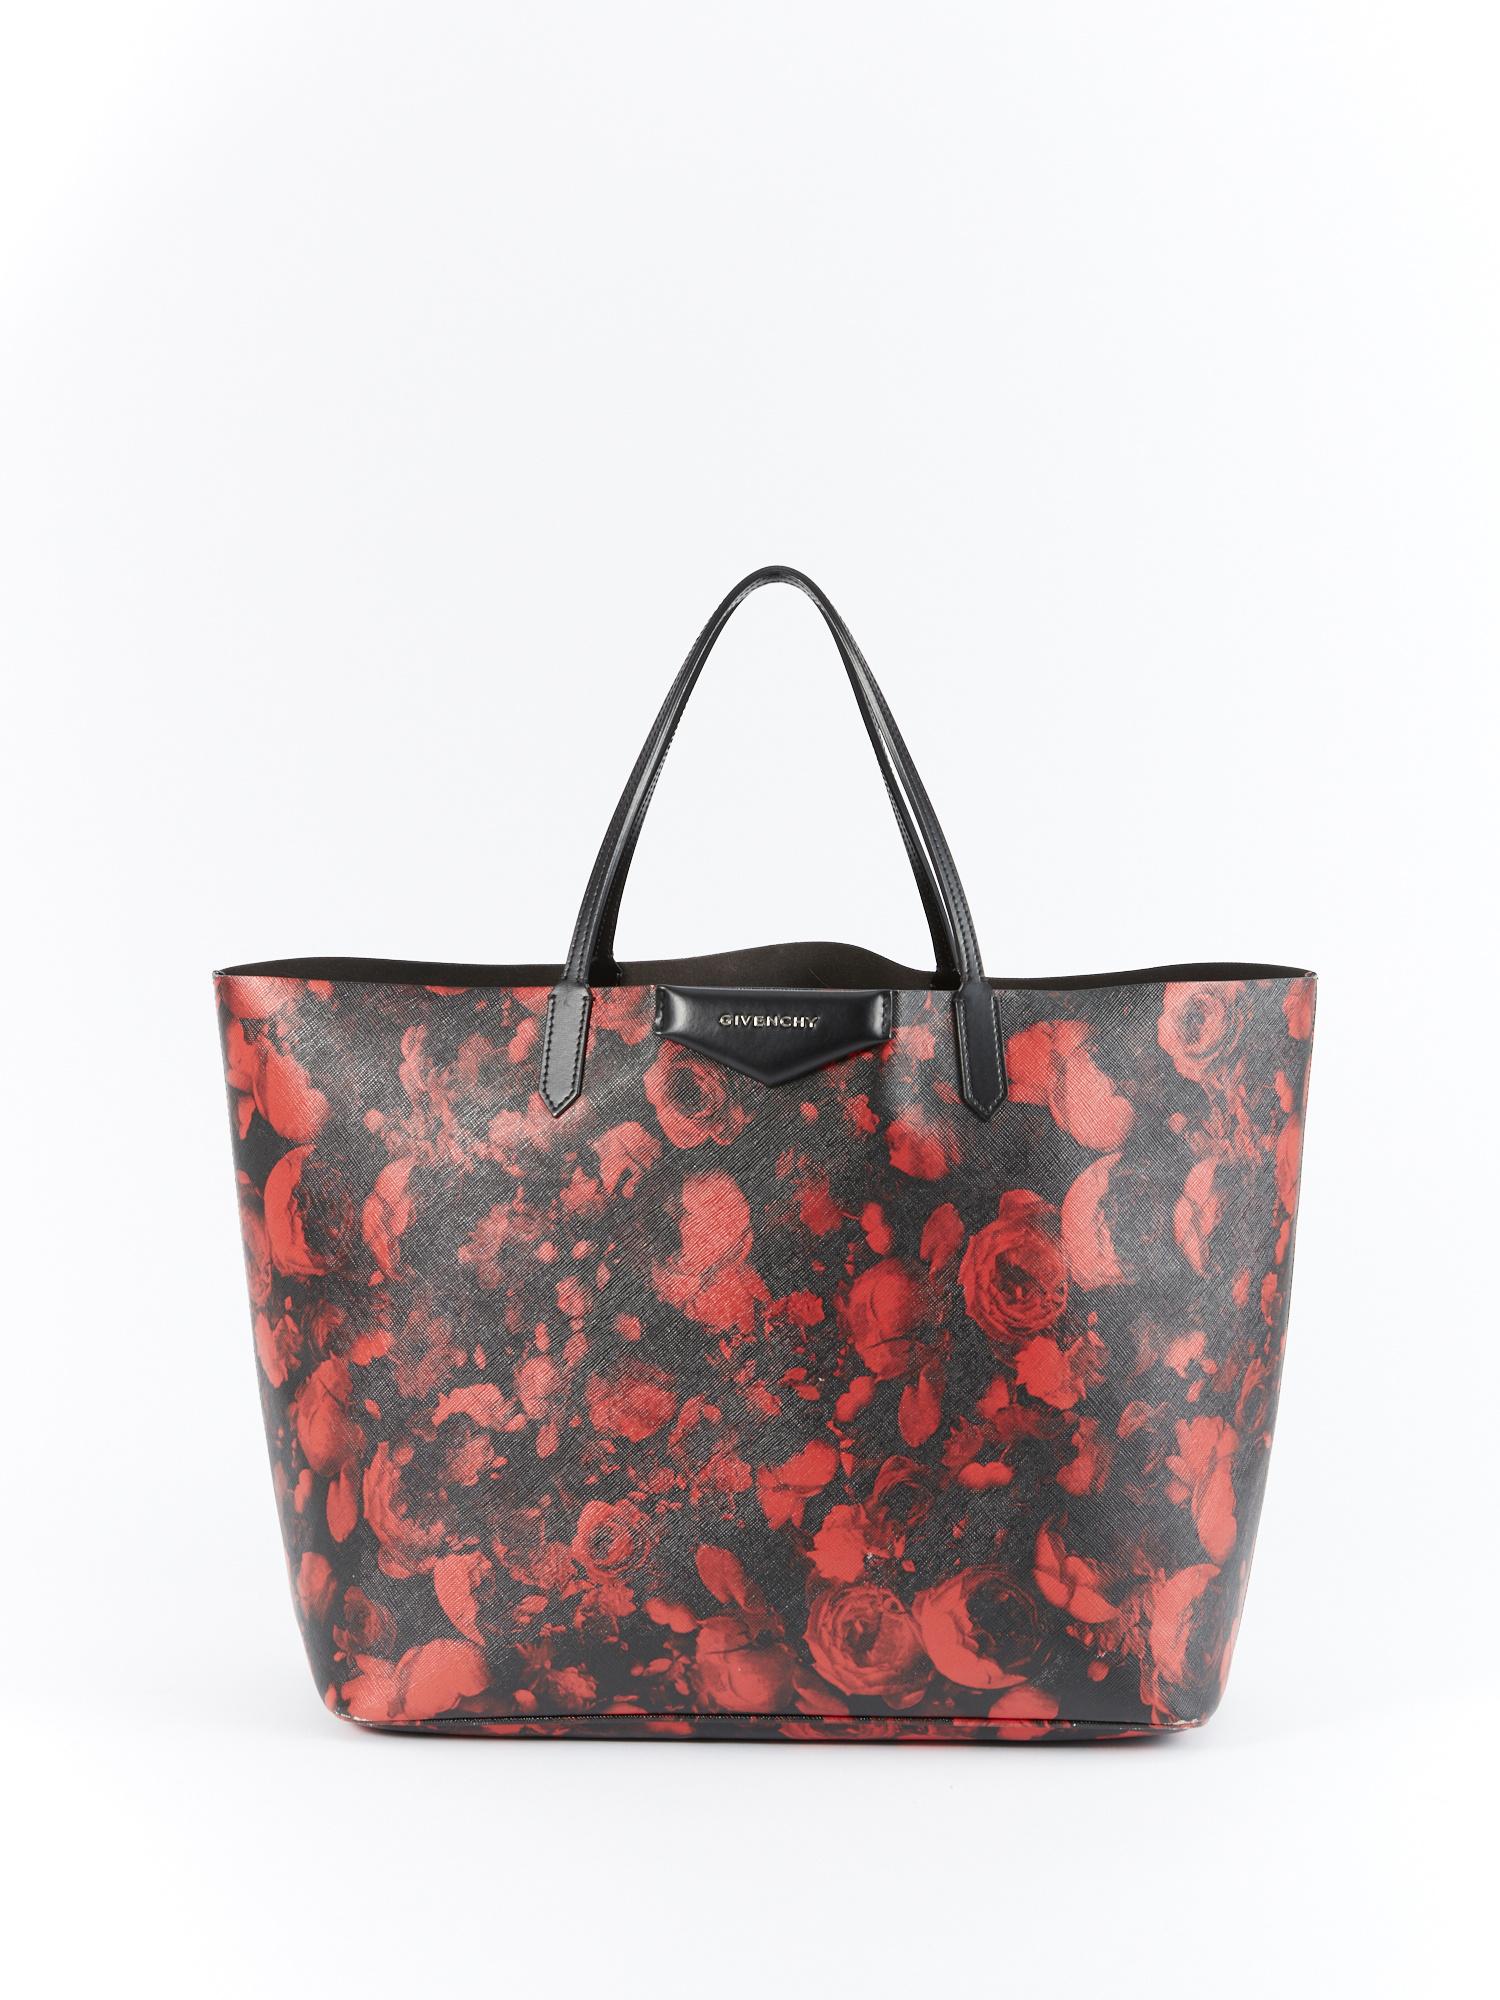 Givenchy Antigona Tote Bag Ruse